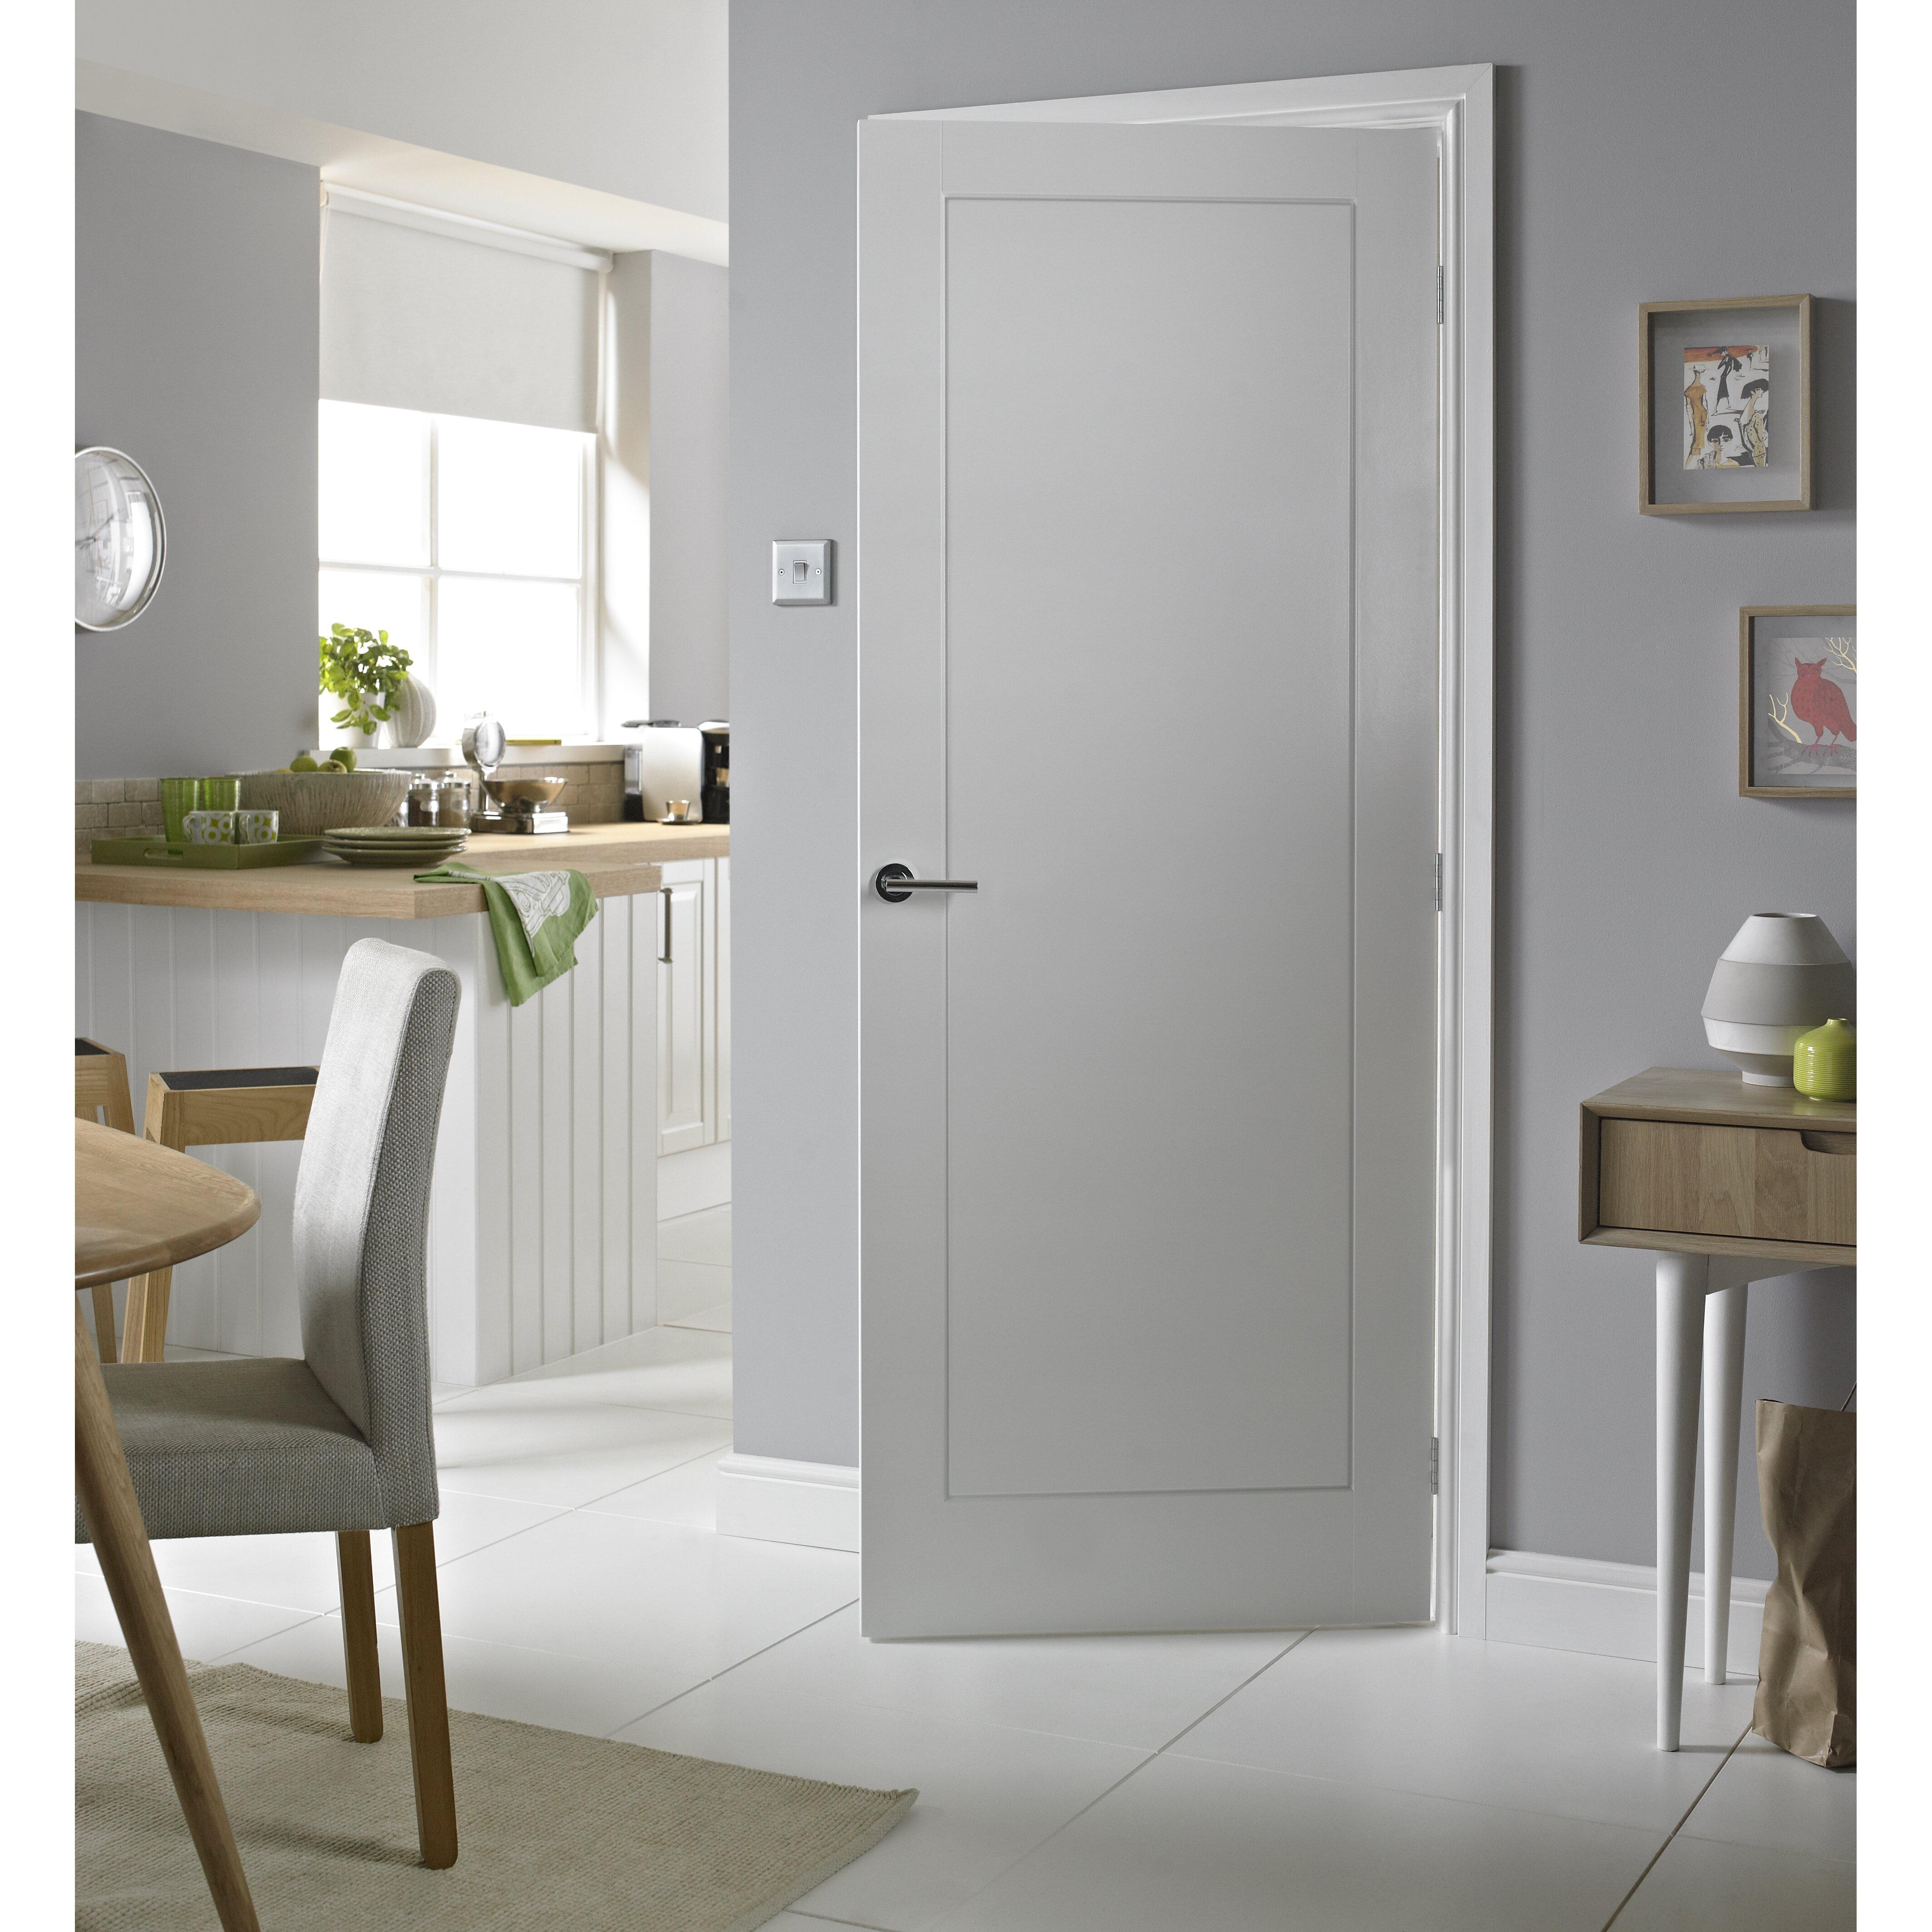 premdor 1 panel white smooth internal door reviews. Black Bedroom Furniture Sets. Home Design Ideas